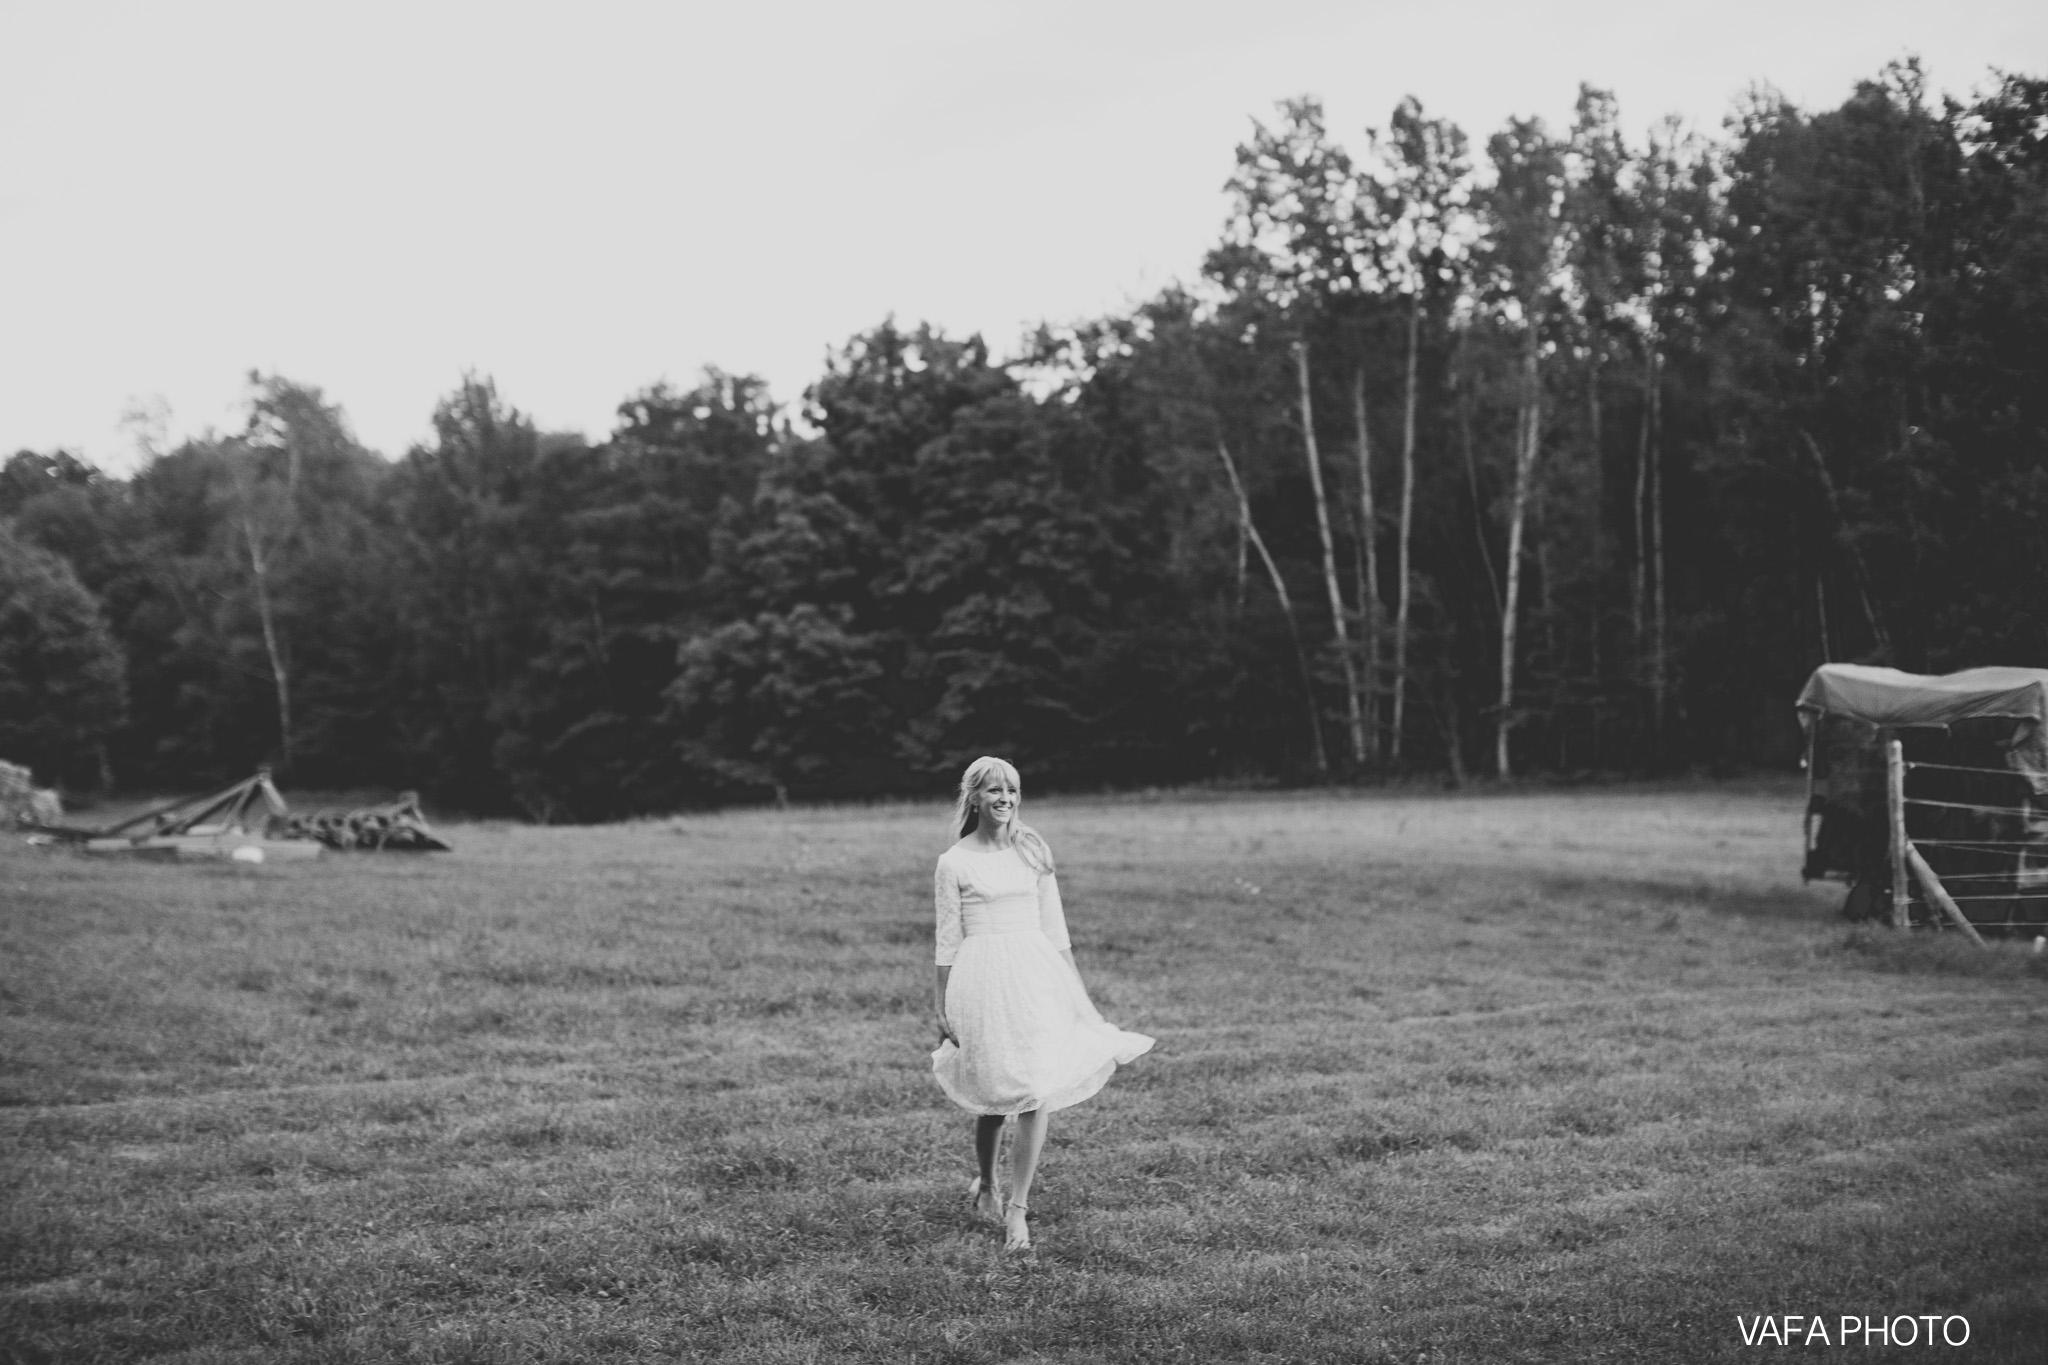 Belsolda-Farm-Wedding-Christy-Eric-Vafa-Photo-747.jpg